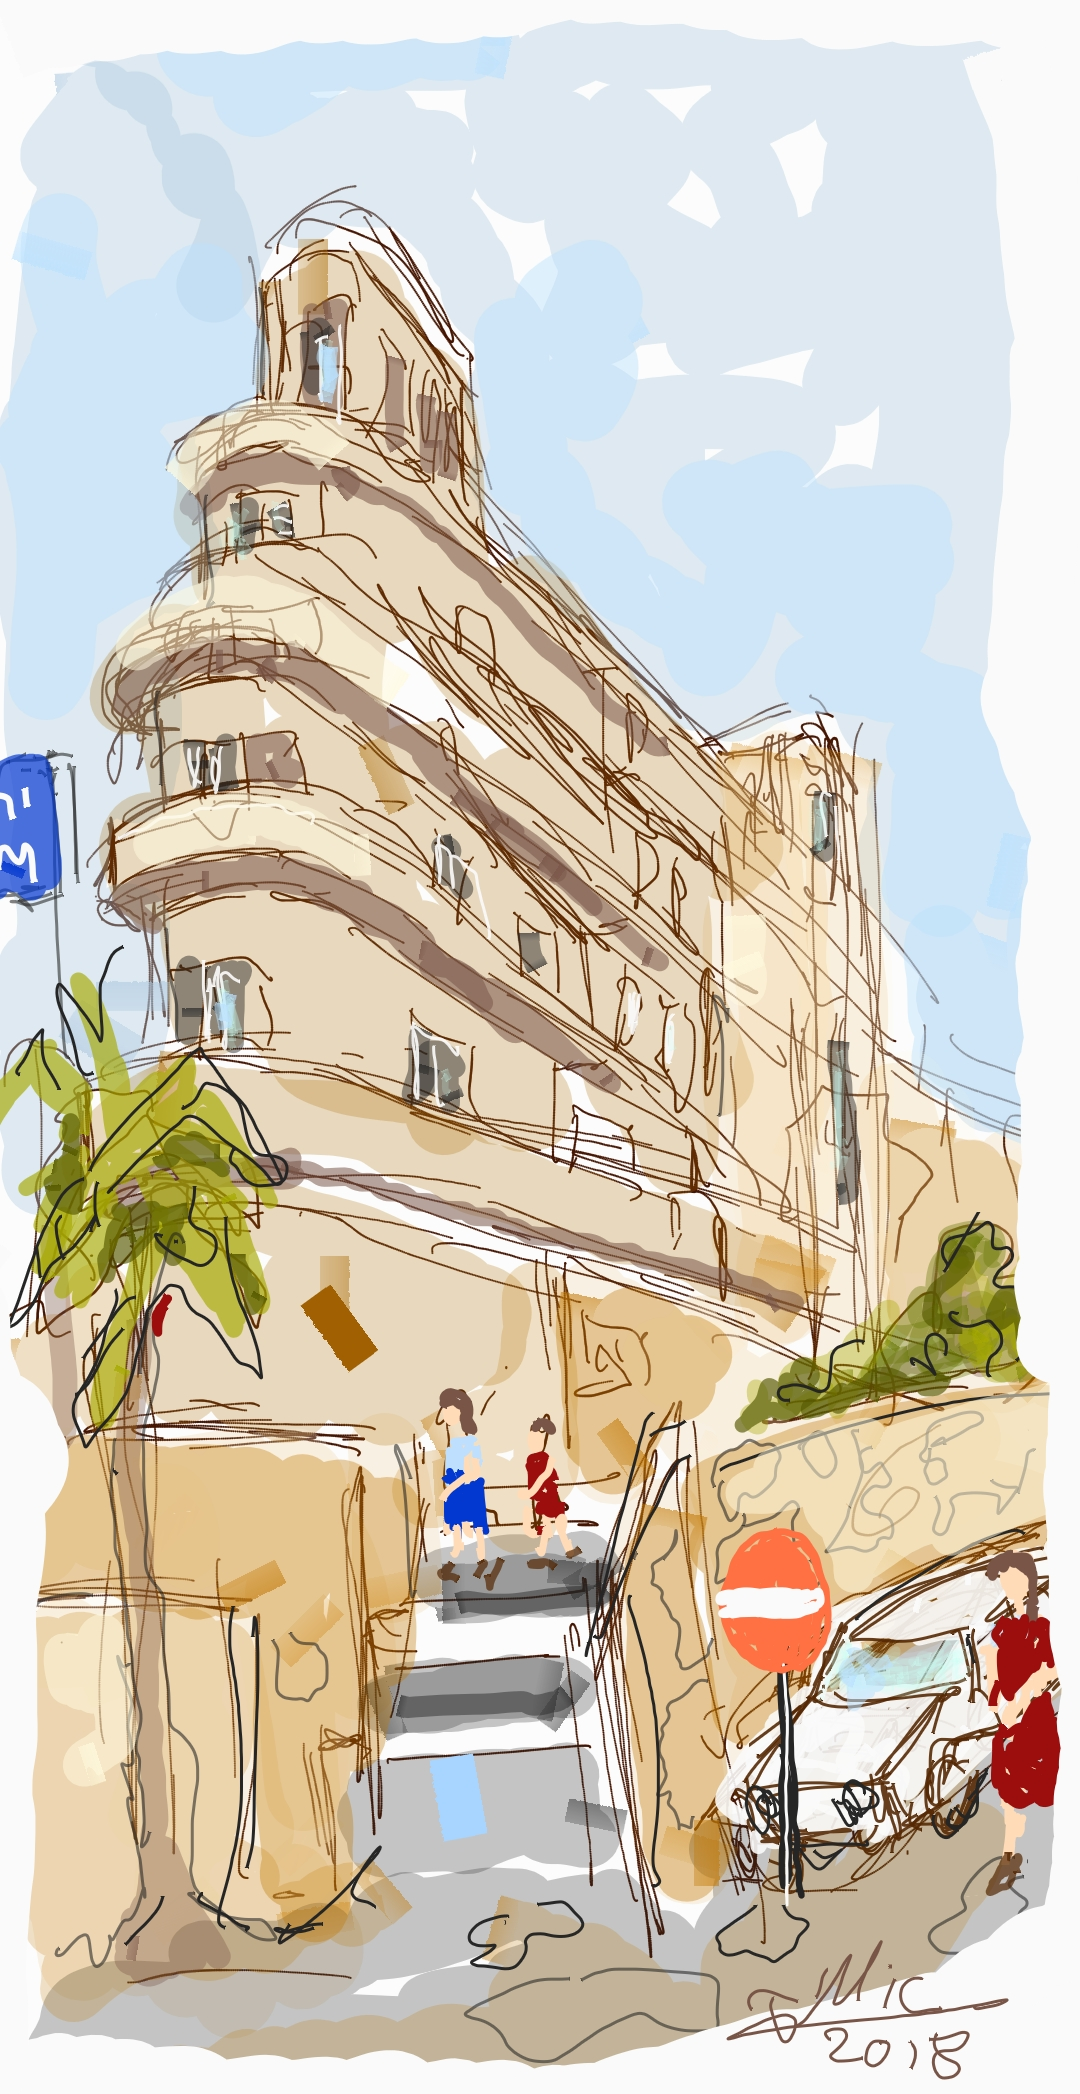 100 Bauhaus Architectural style Centenary in Tel Aviv